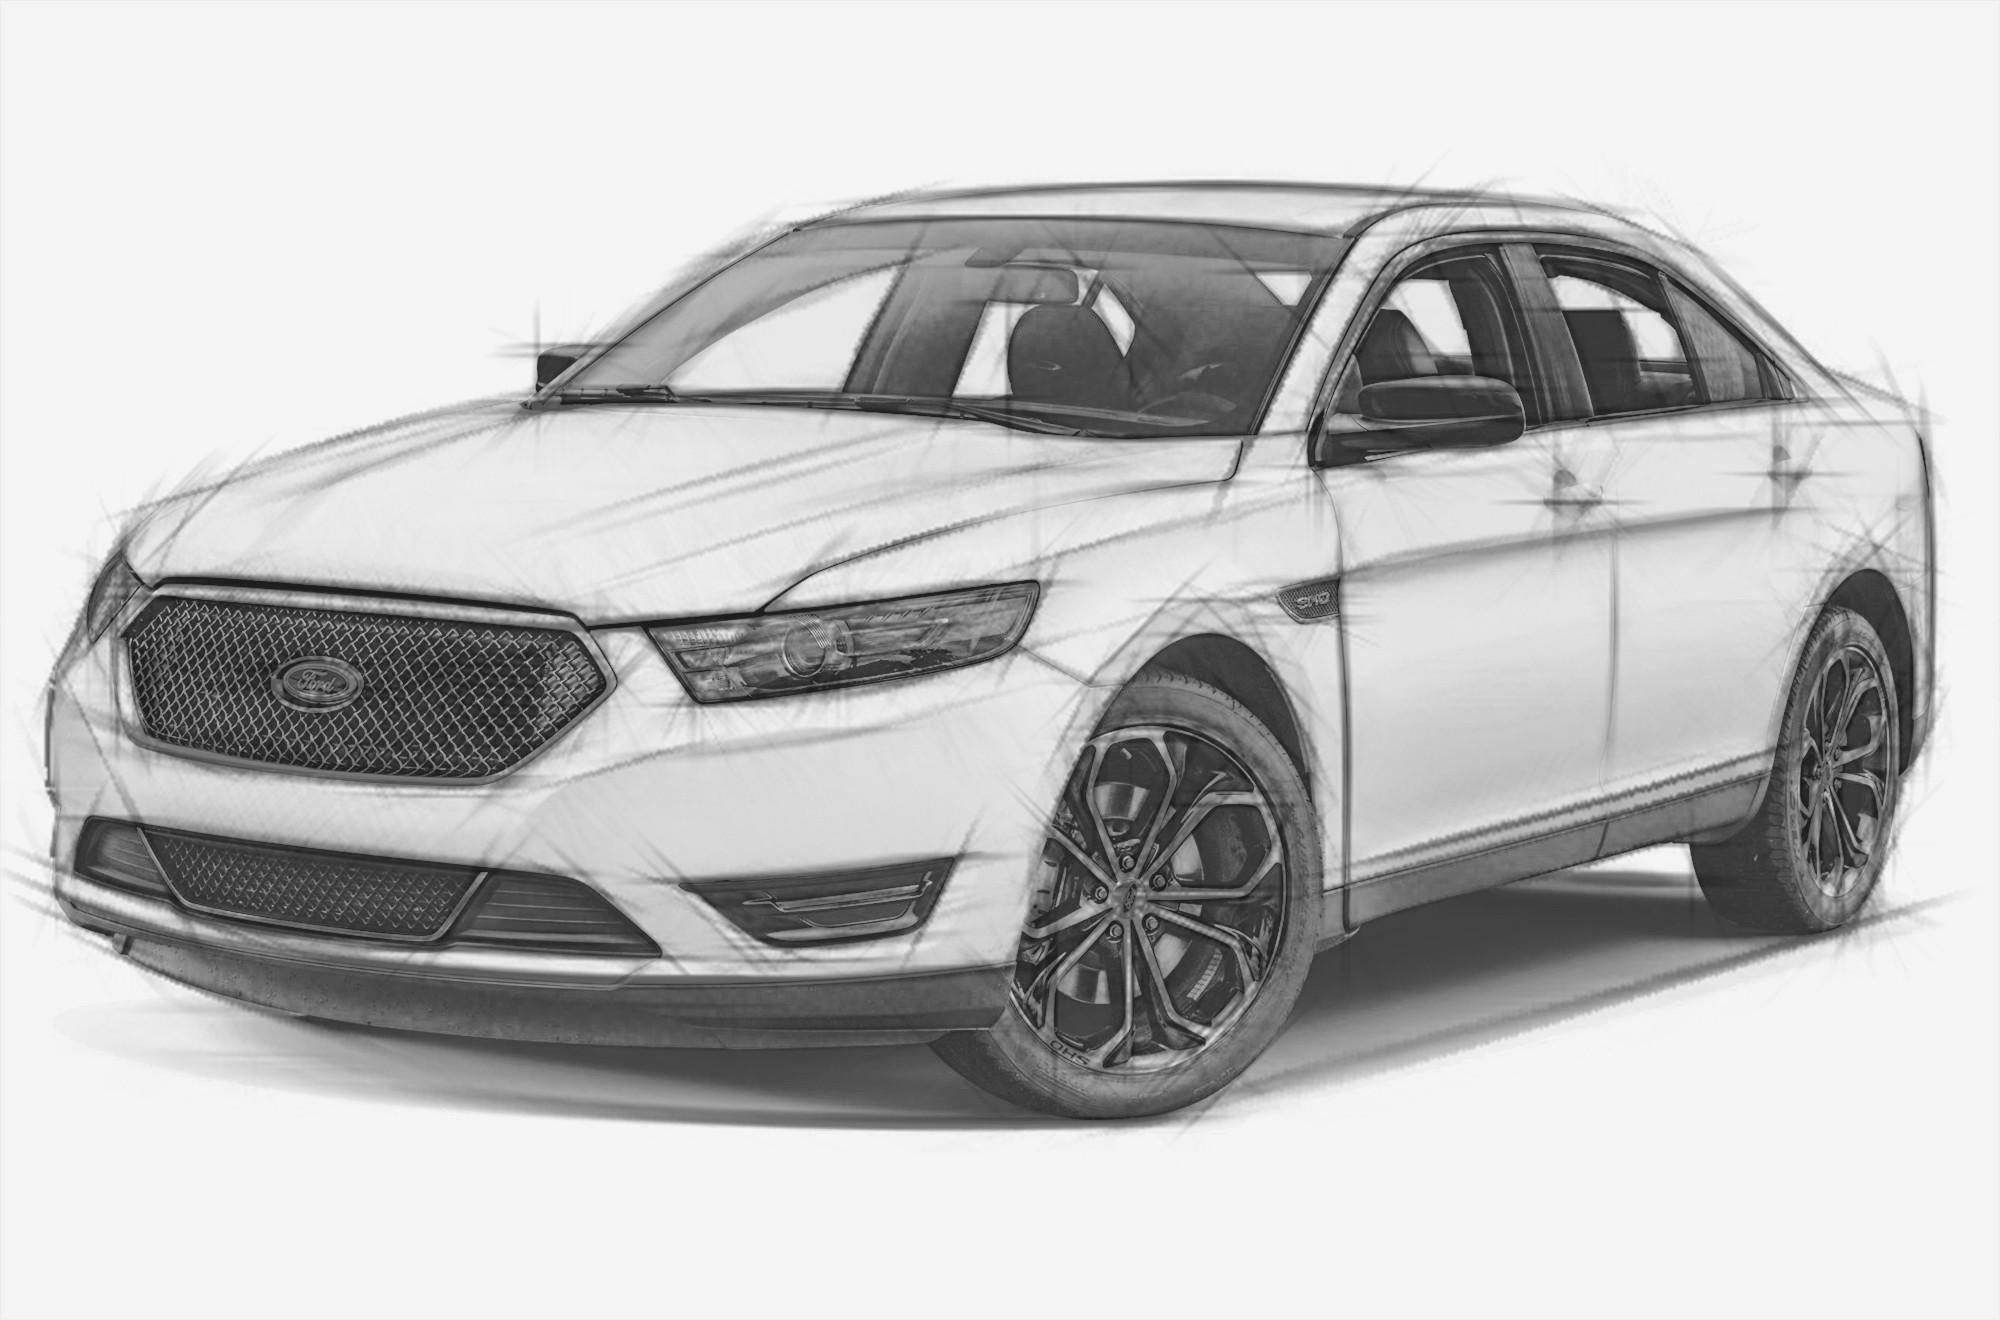 Ford-Taurus-LED-Bulbs-Replacement-Headlights-Brake-Reverse-Lights